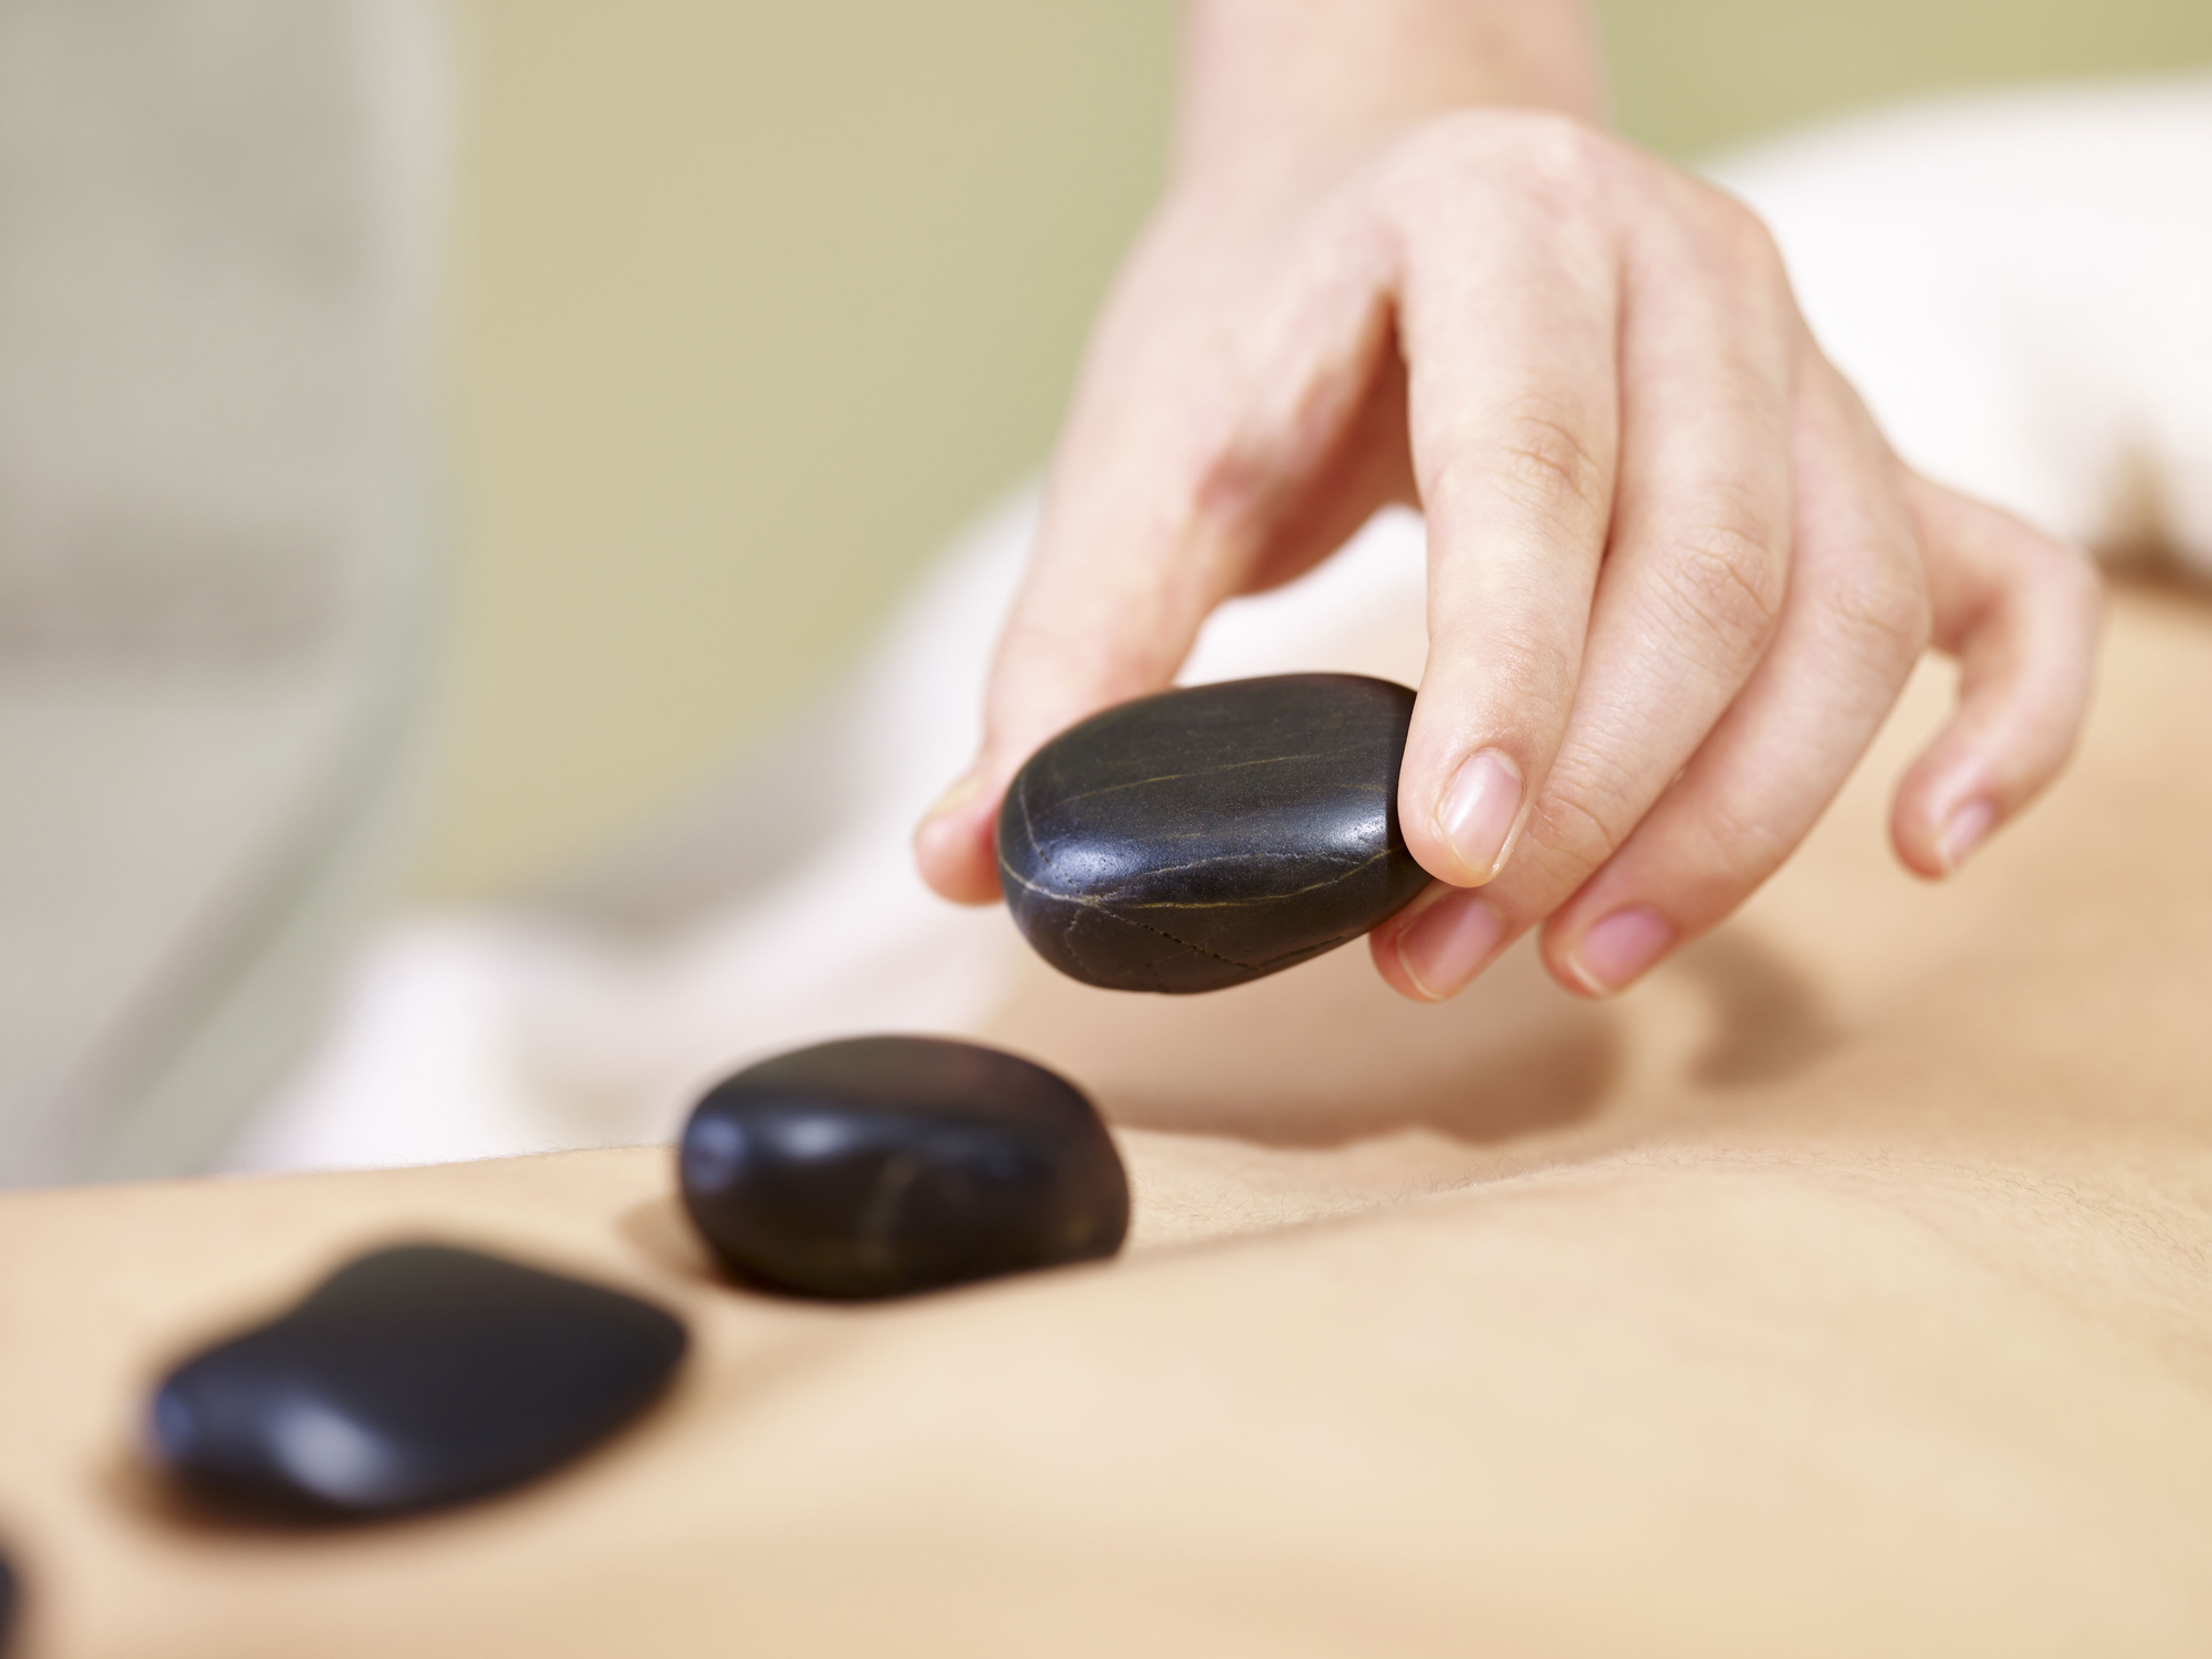 Hotstone Massage Ganzkörper